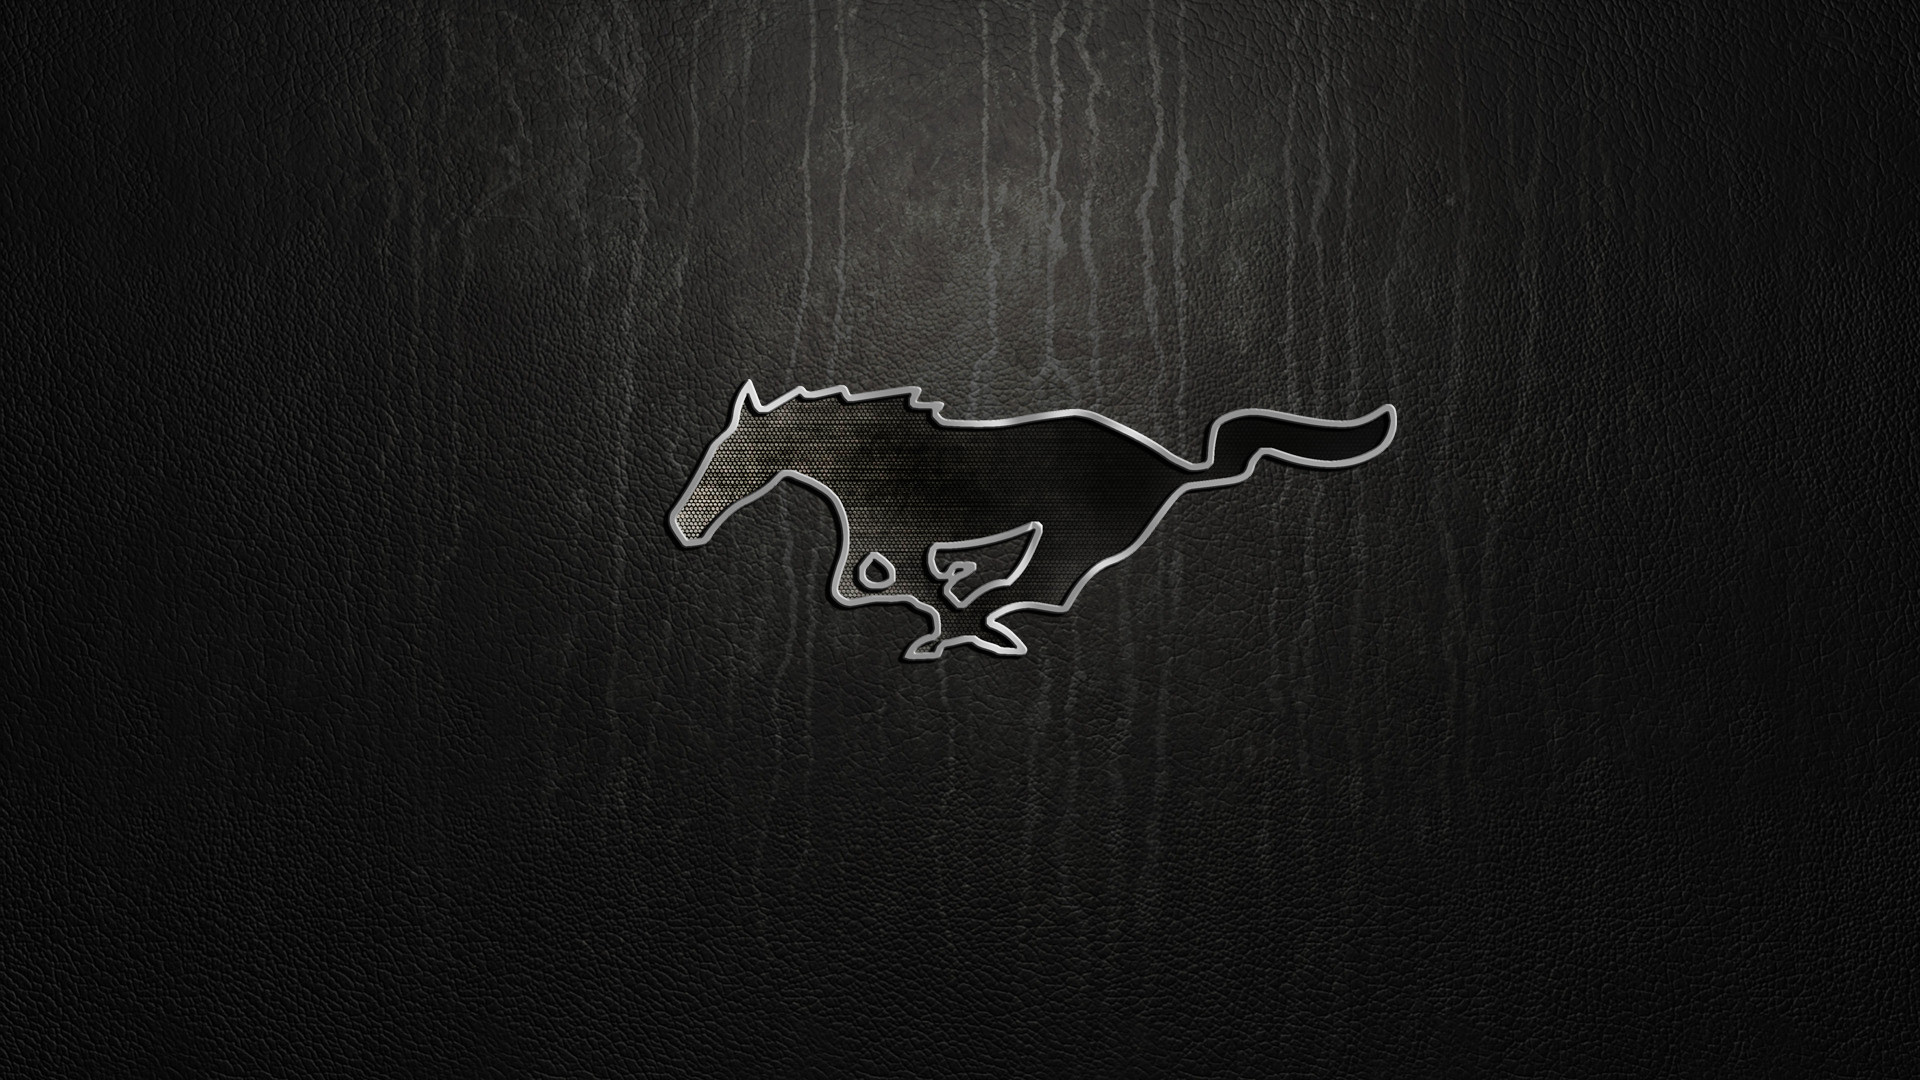 Ford Mustang Logo Wallpaper Hd